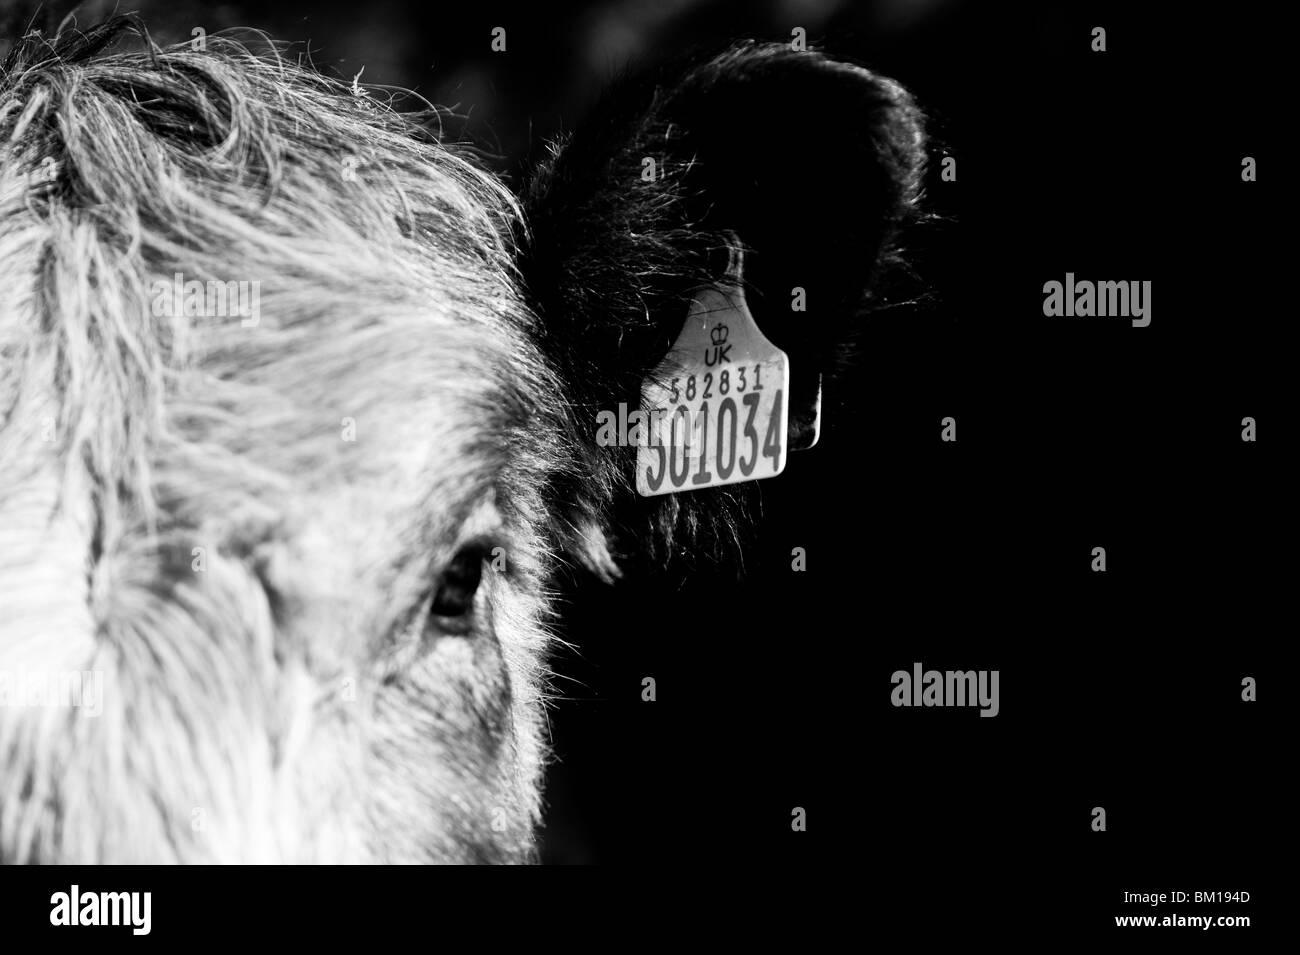 Cow Galloway Robert Farming Countryside Bull Calf - Stock Image